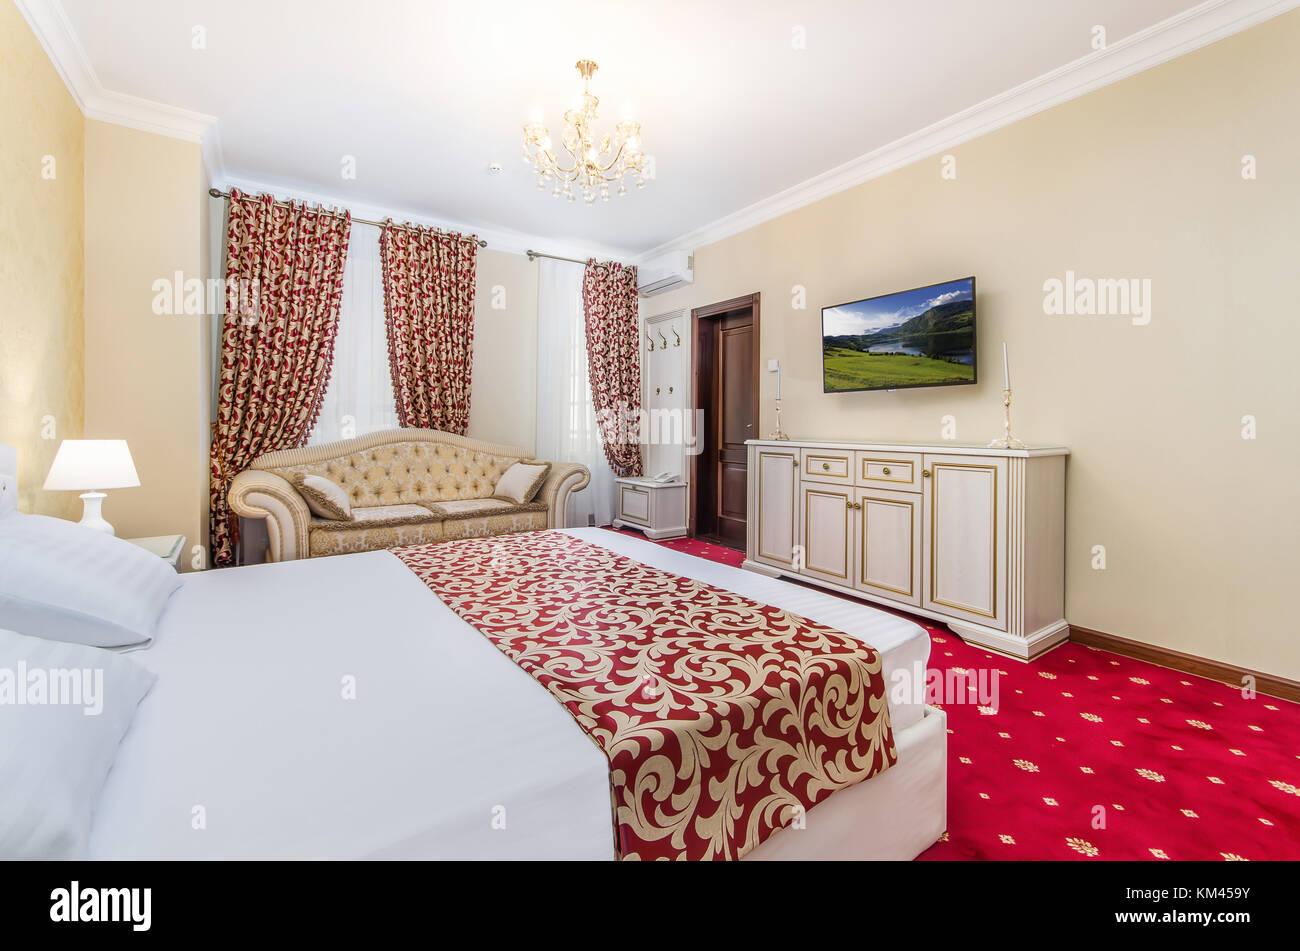 interior moldova hotel pak Lane Moldova Chisinau - Stock Image